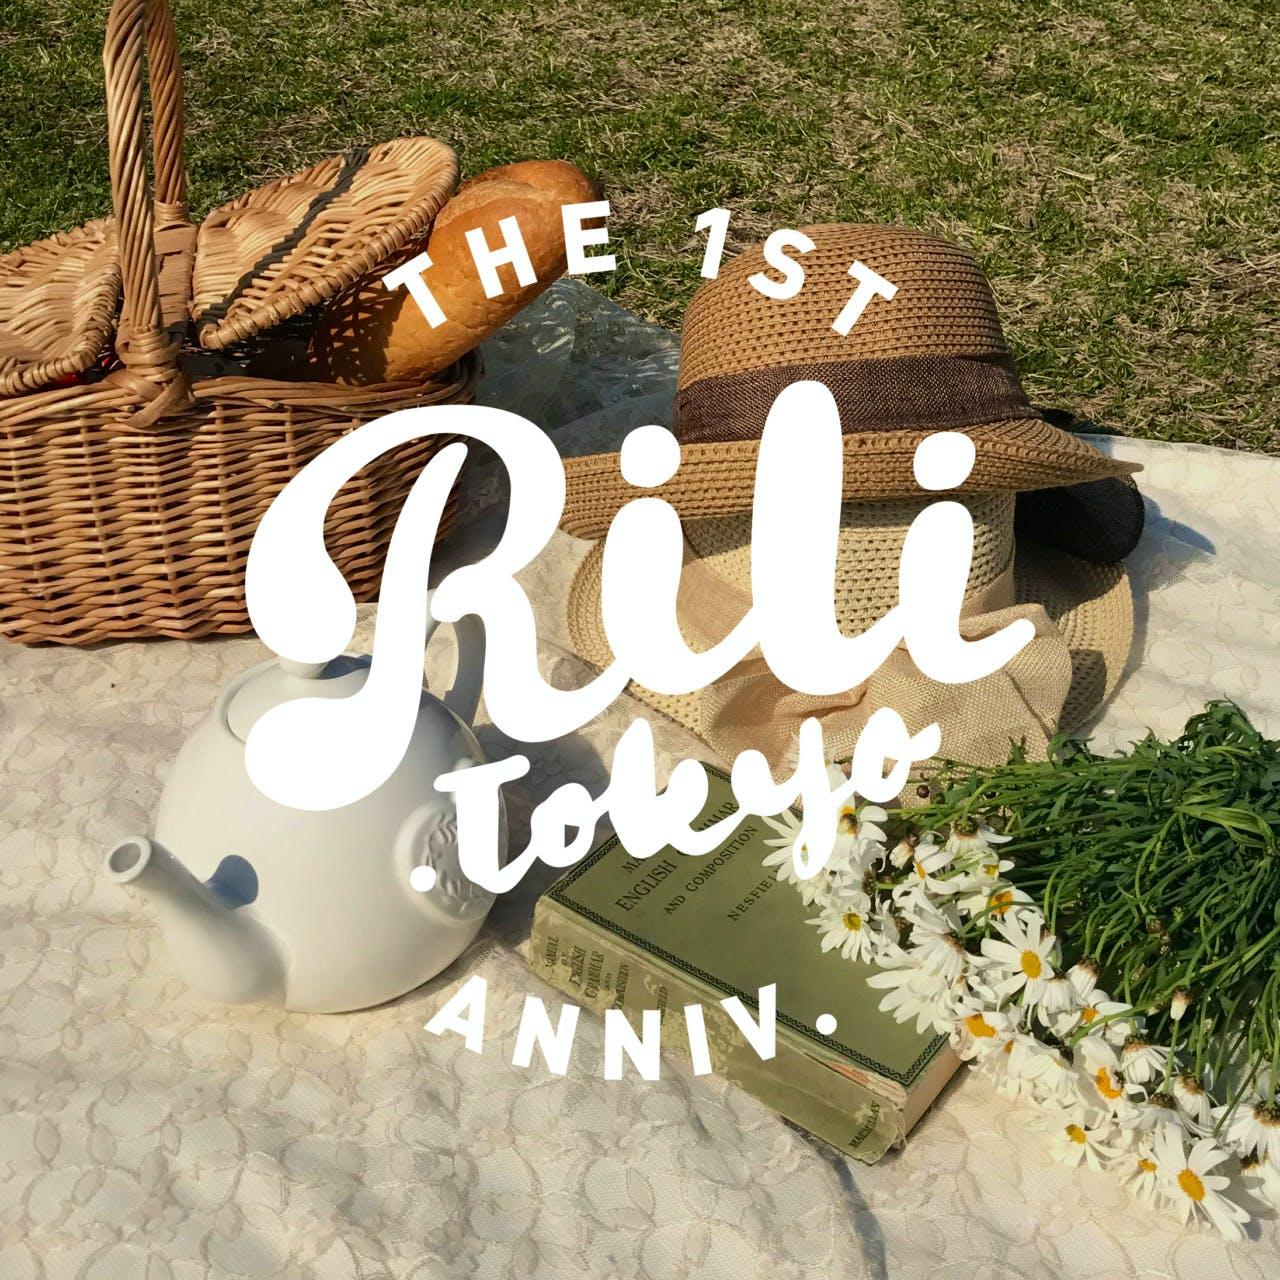 RiLi1周年アニバーサリーウィーク🎉🎉みんなの「RiLiっぽ◯◯◯」な写真募集中